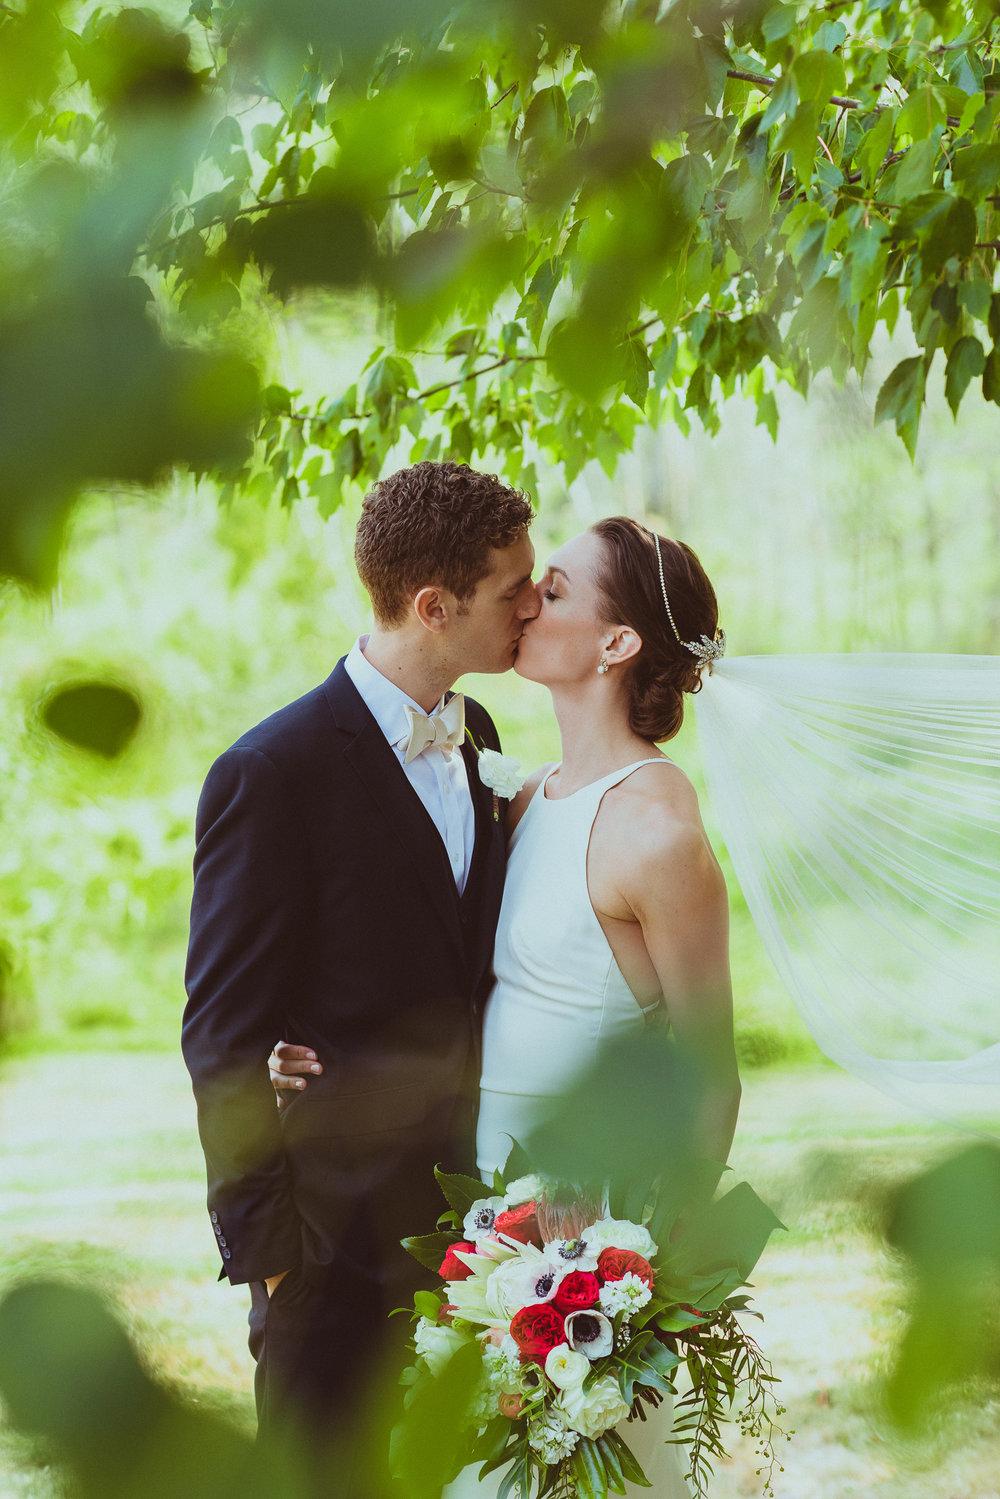 BEST_CHICAG_WEDDING_PHOTOGRAPHER_ZOE_RAIN_-42.jpg